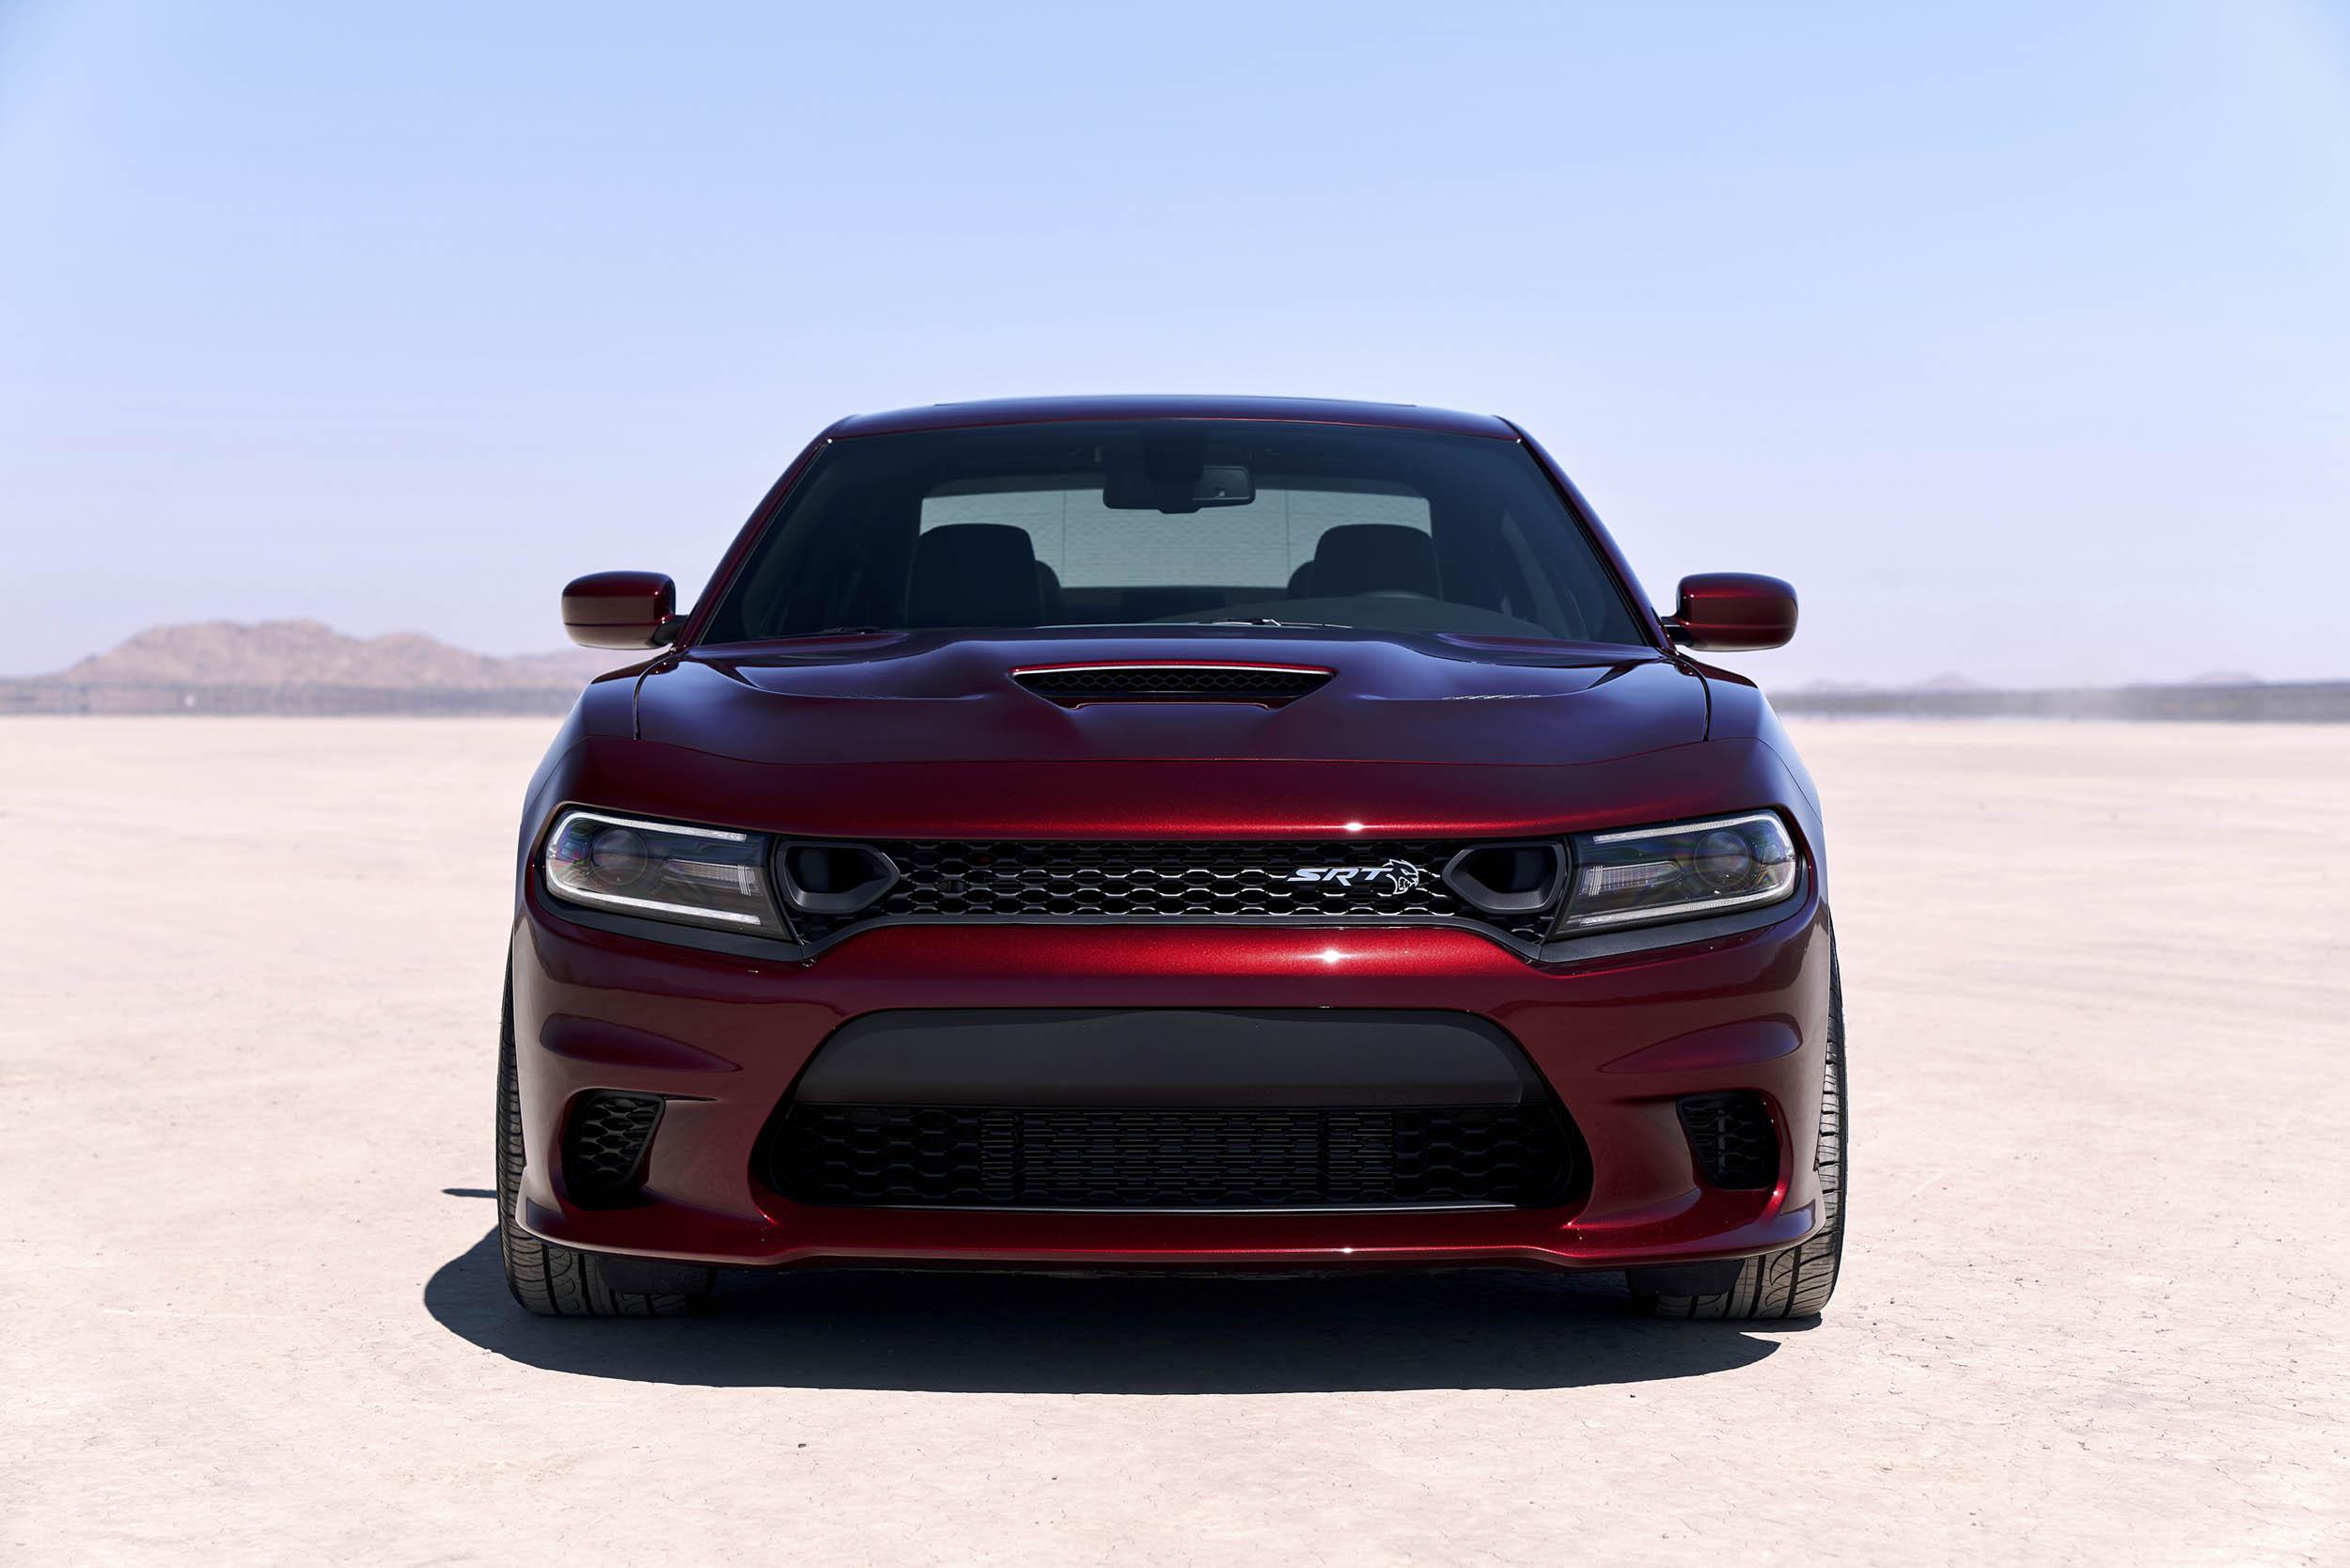 2019 Dodge Charger SRT Hellcat front